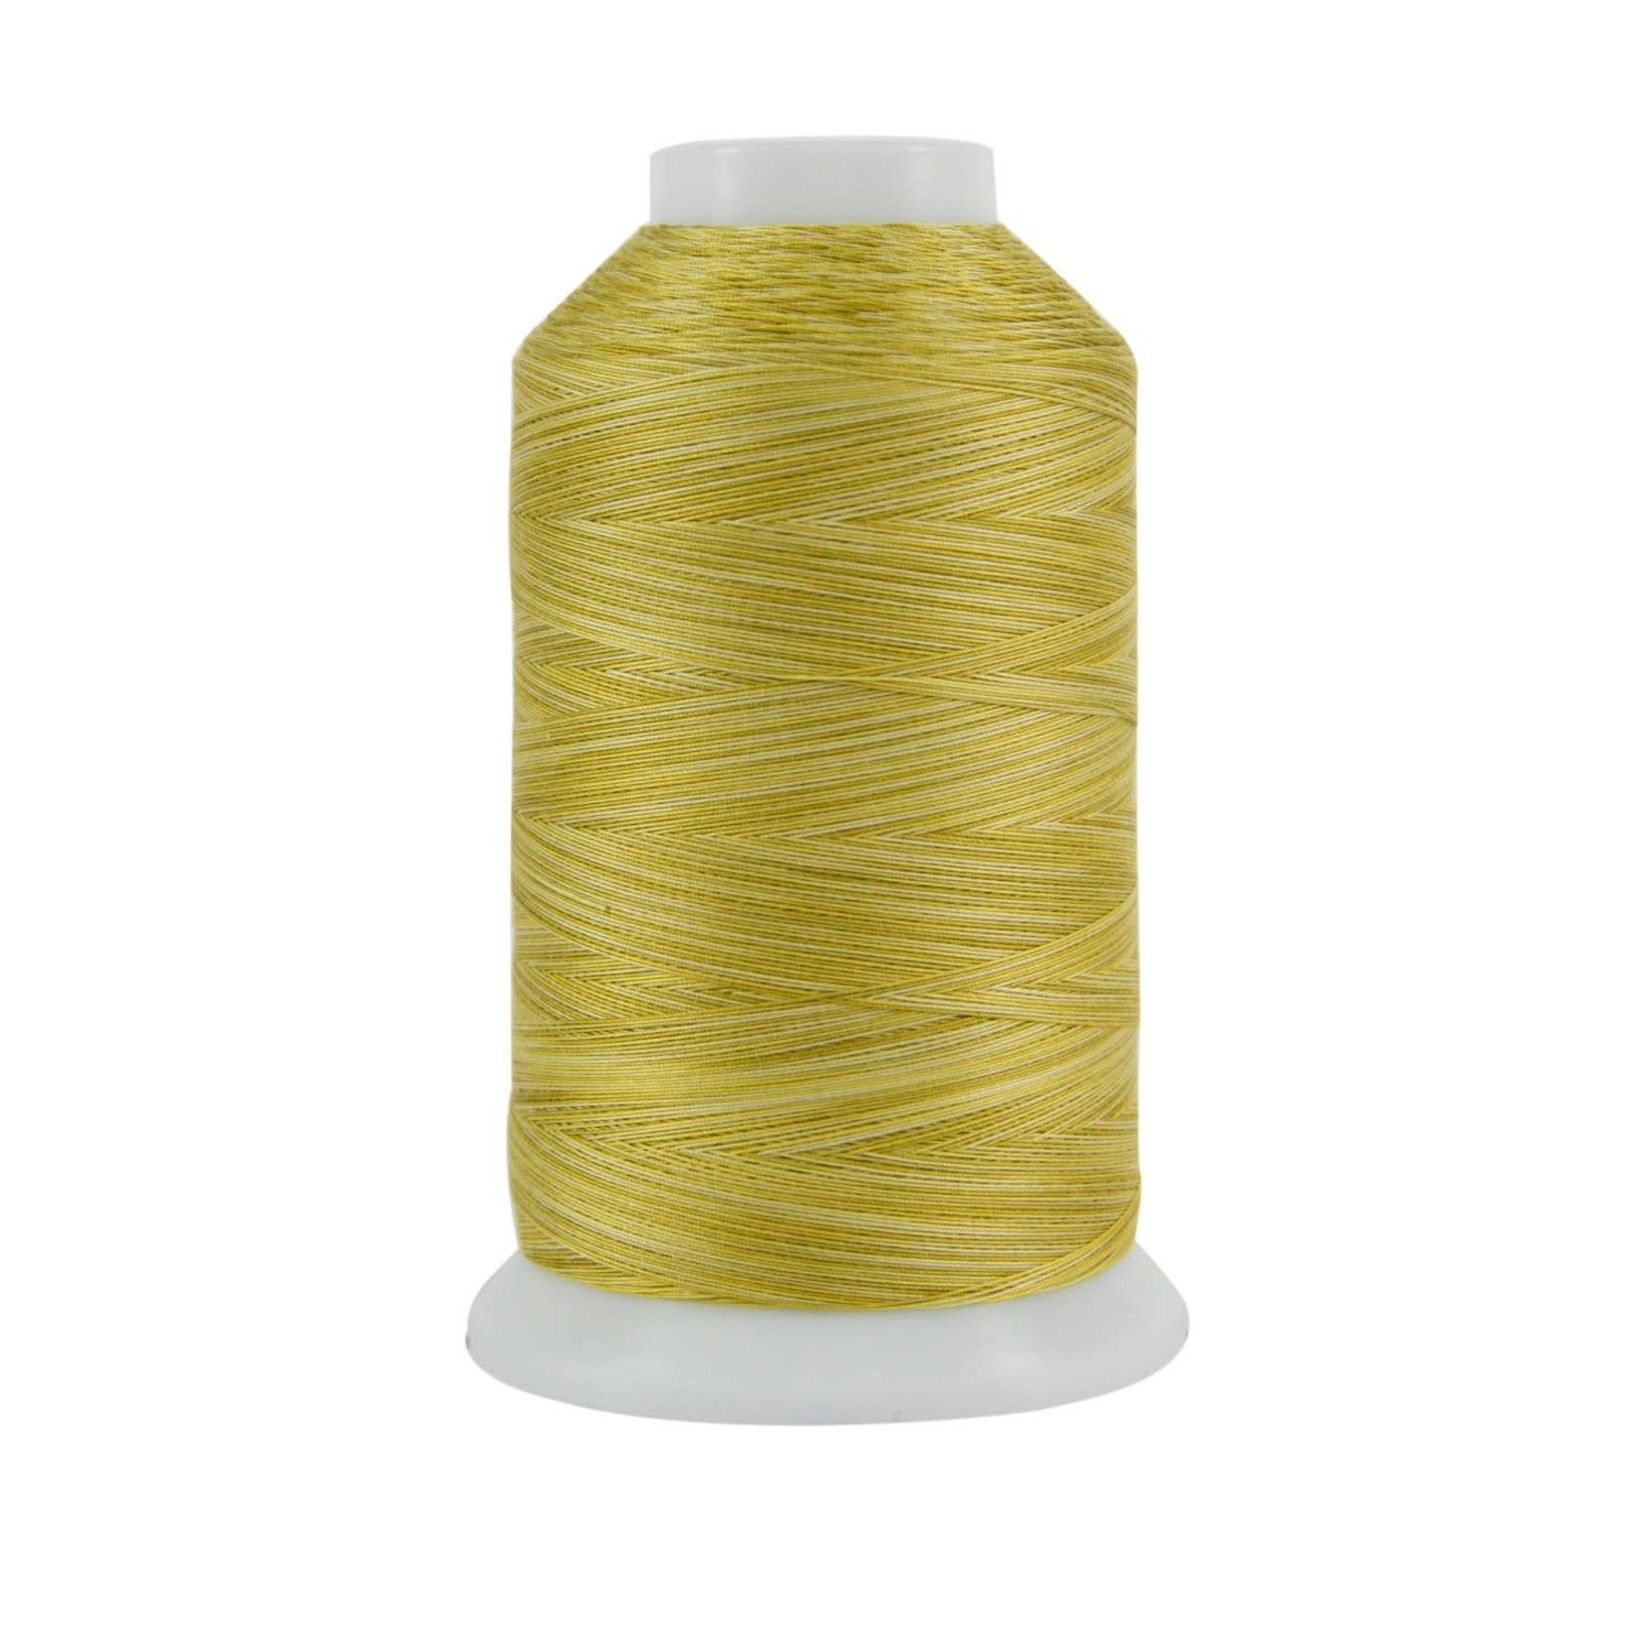 Superior Threads King Tut - #40 - 1828 m - 0965 Sheaves